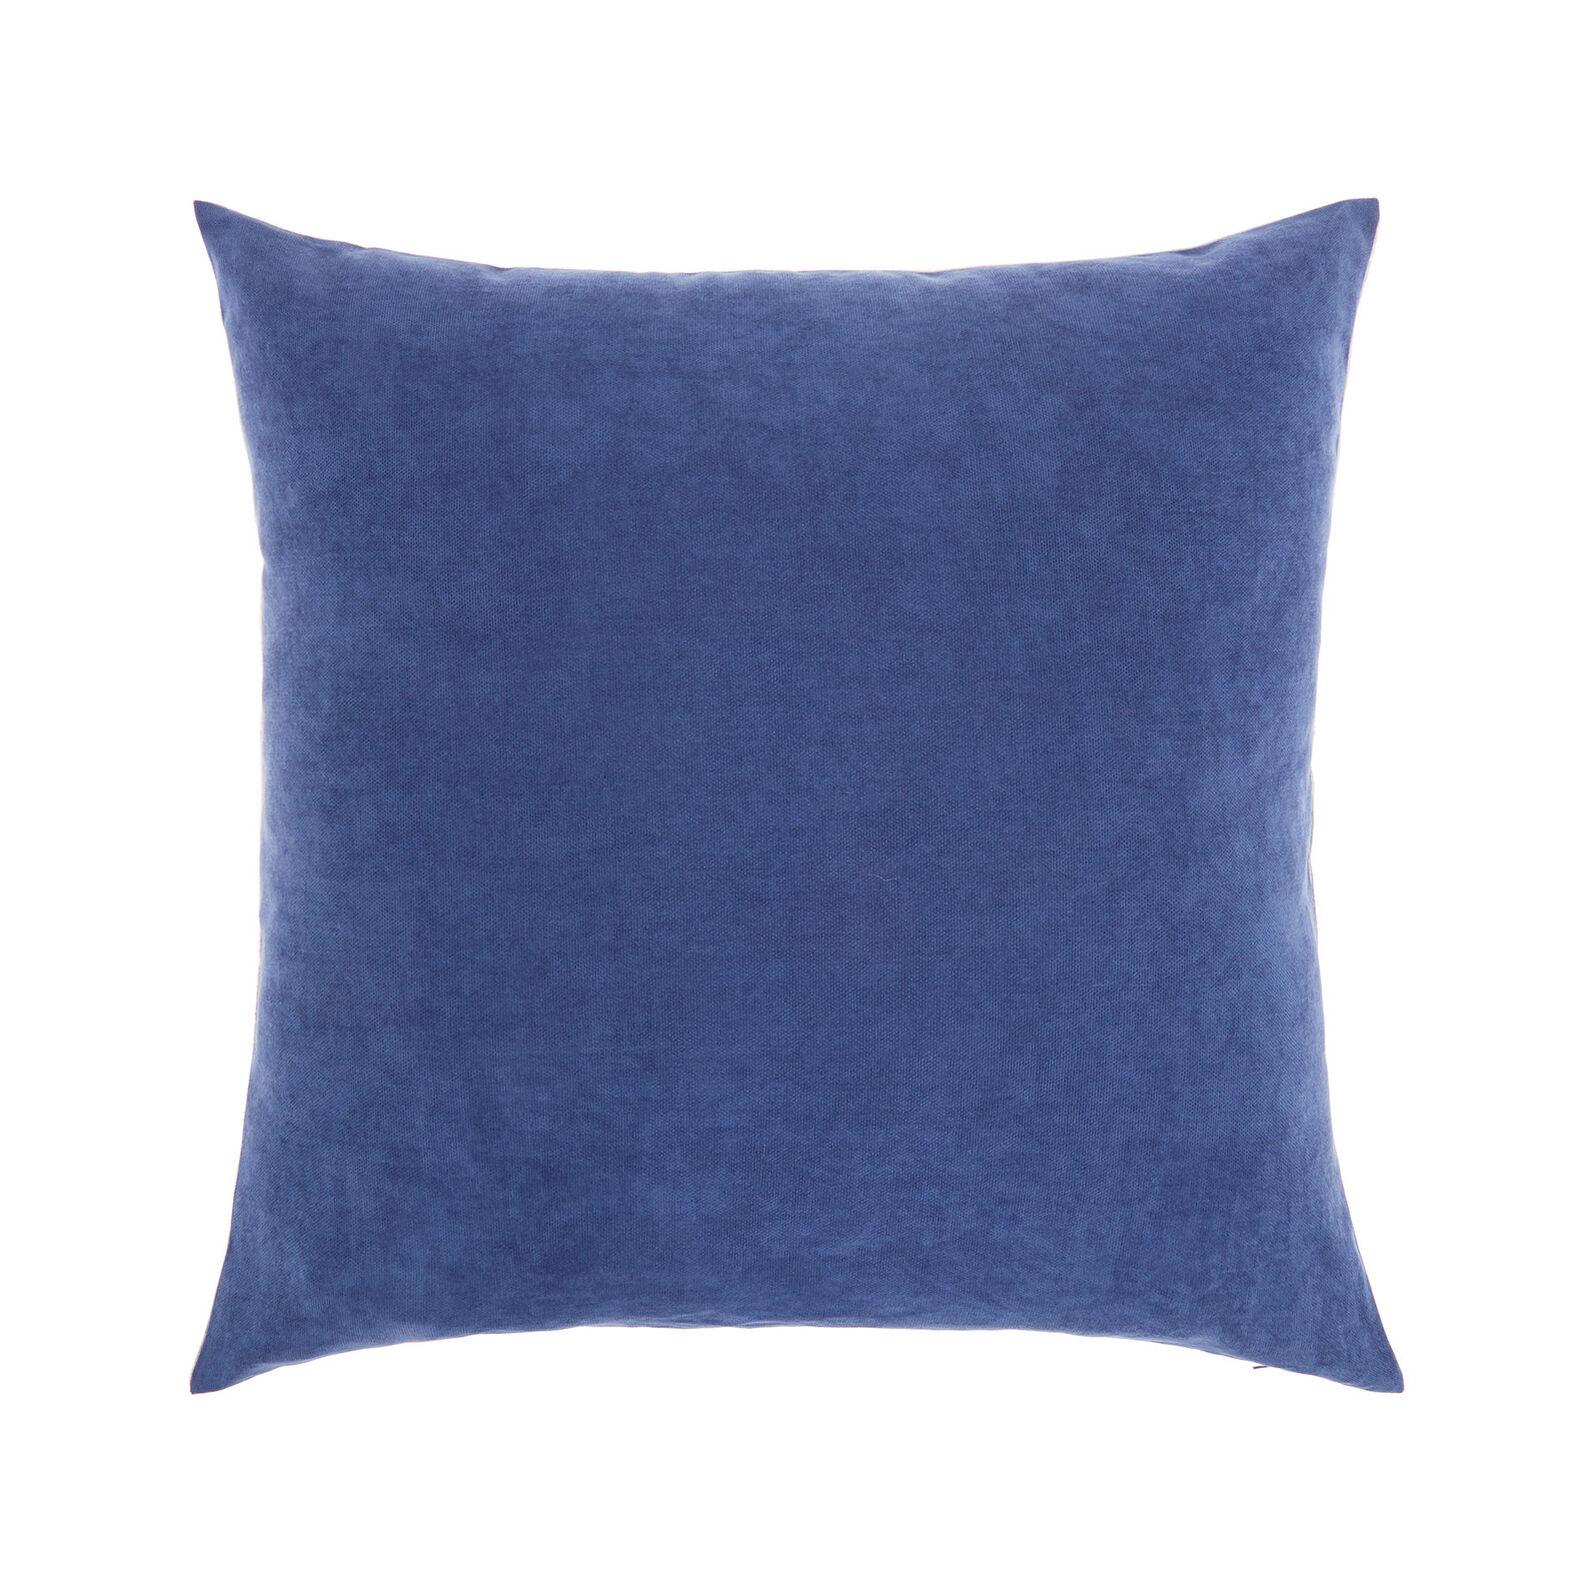 Cushion cover with Gemini print 45x45cm